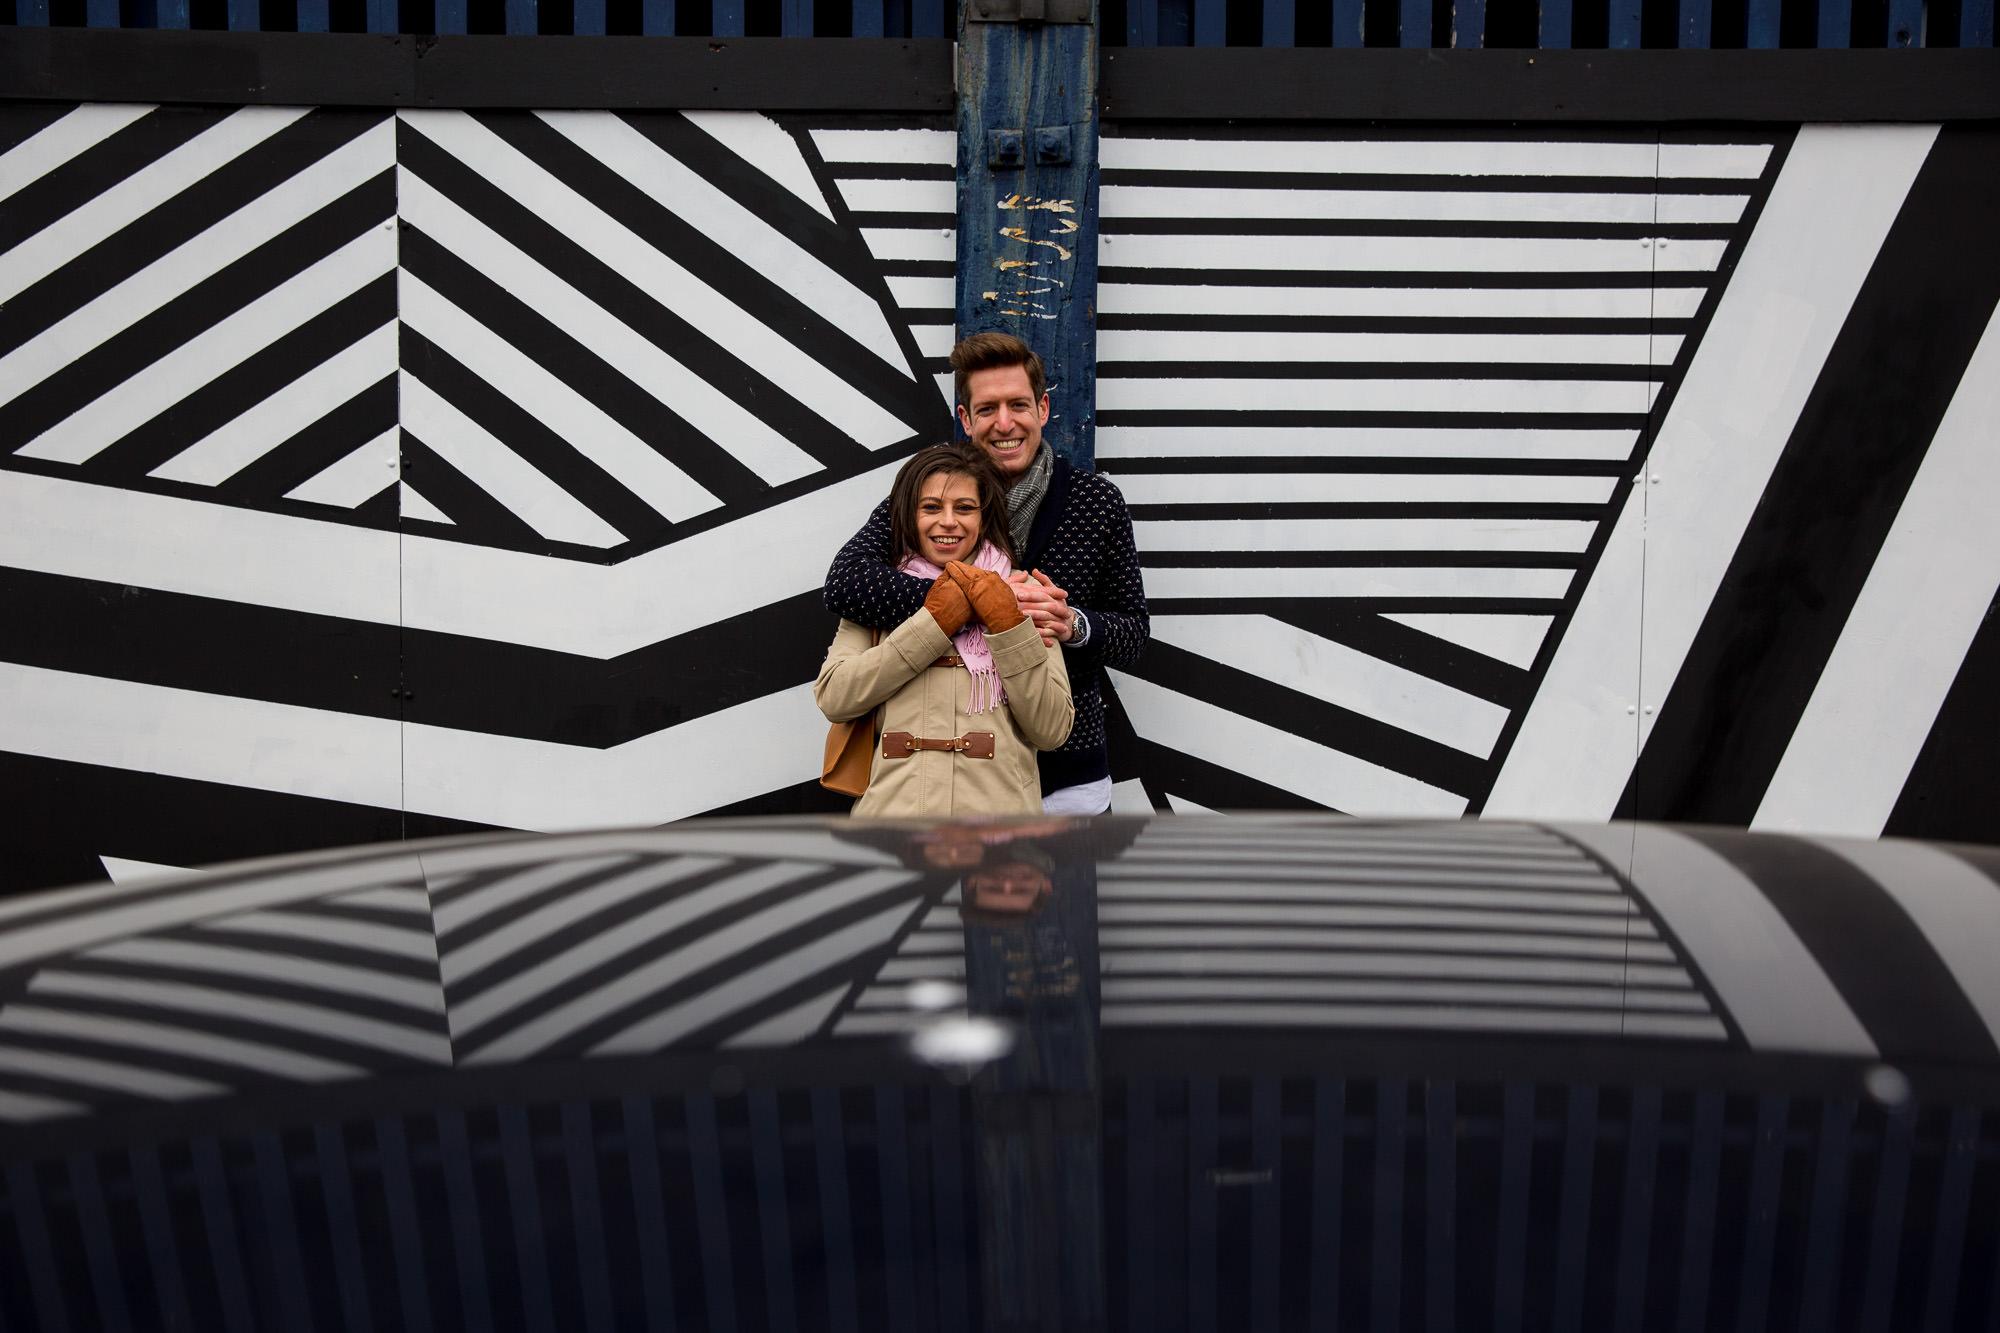 CLAIREBYRNEPHOTOGRAPHY-WEDDING-London-engagment-shoreditch-cute-fun-13.jpg